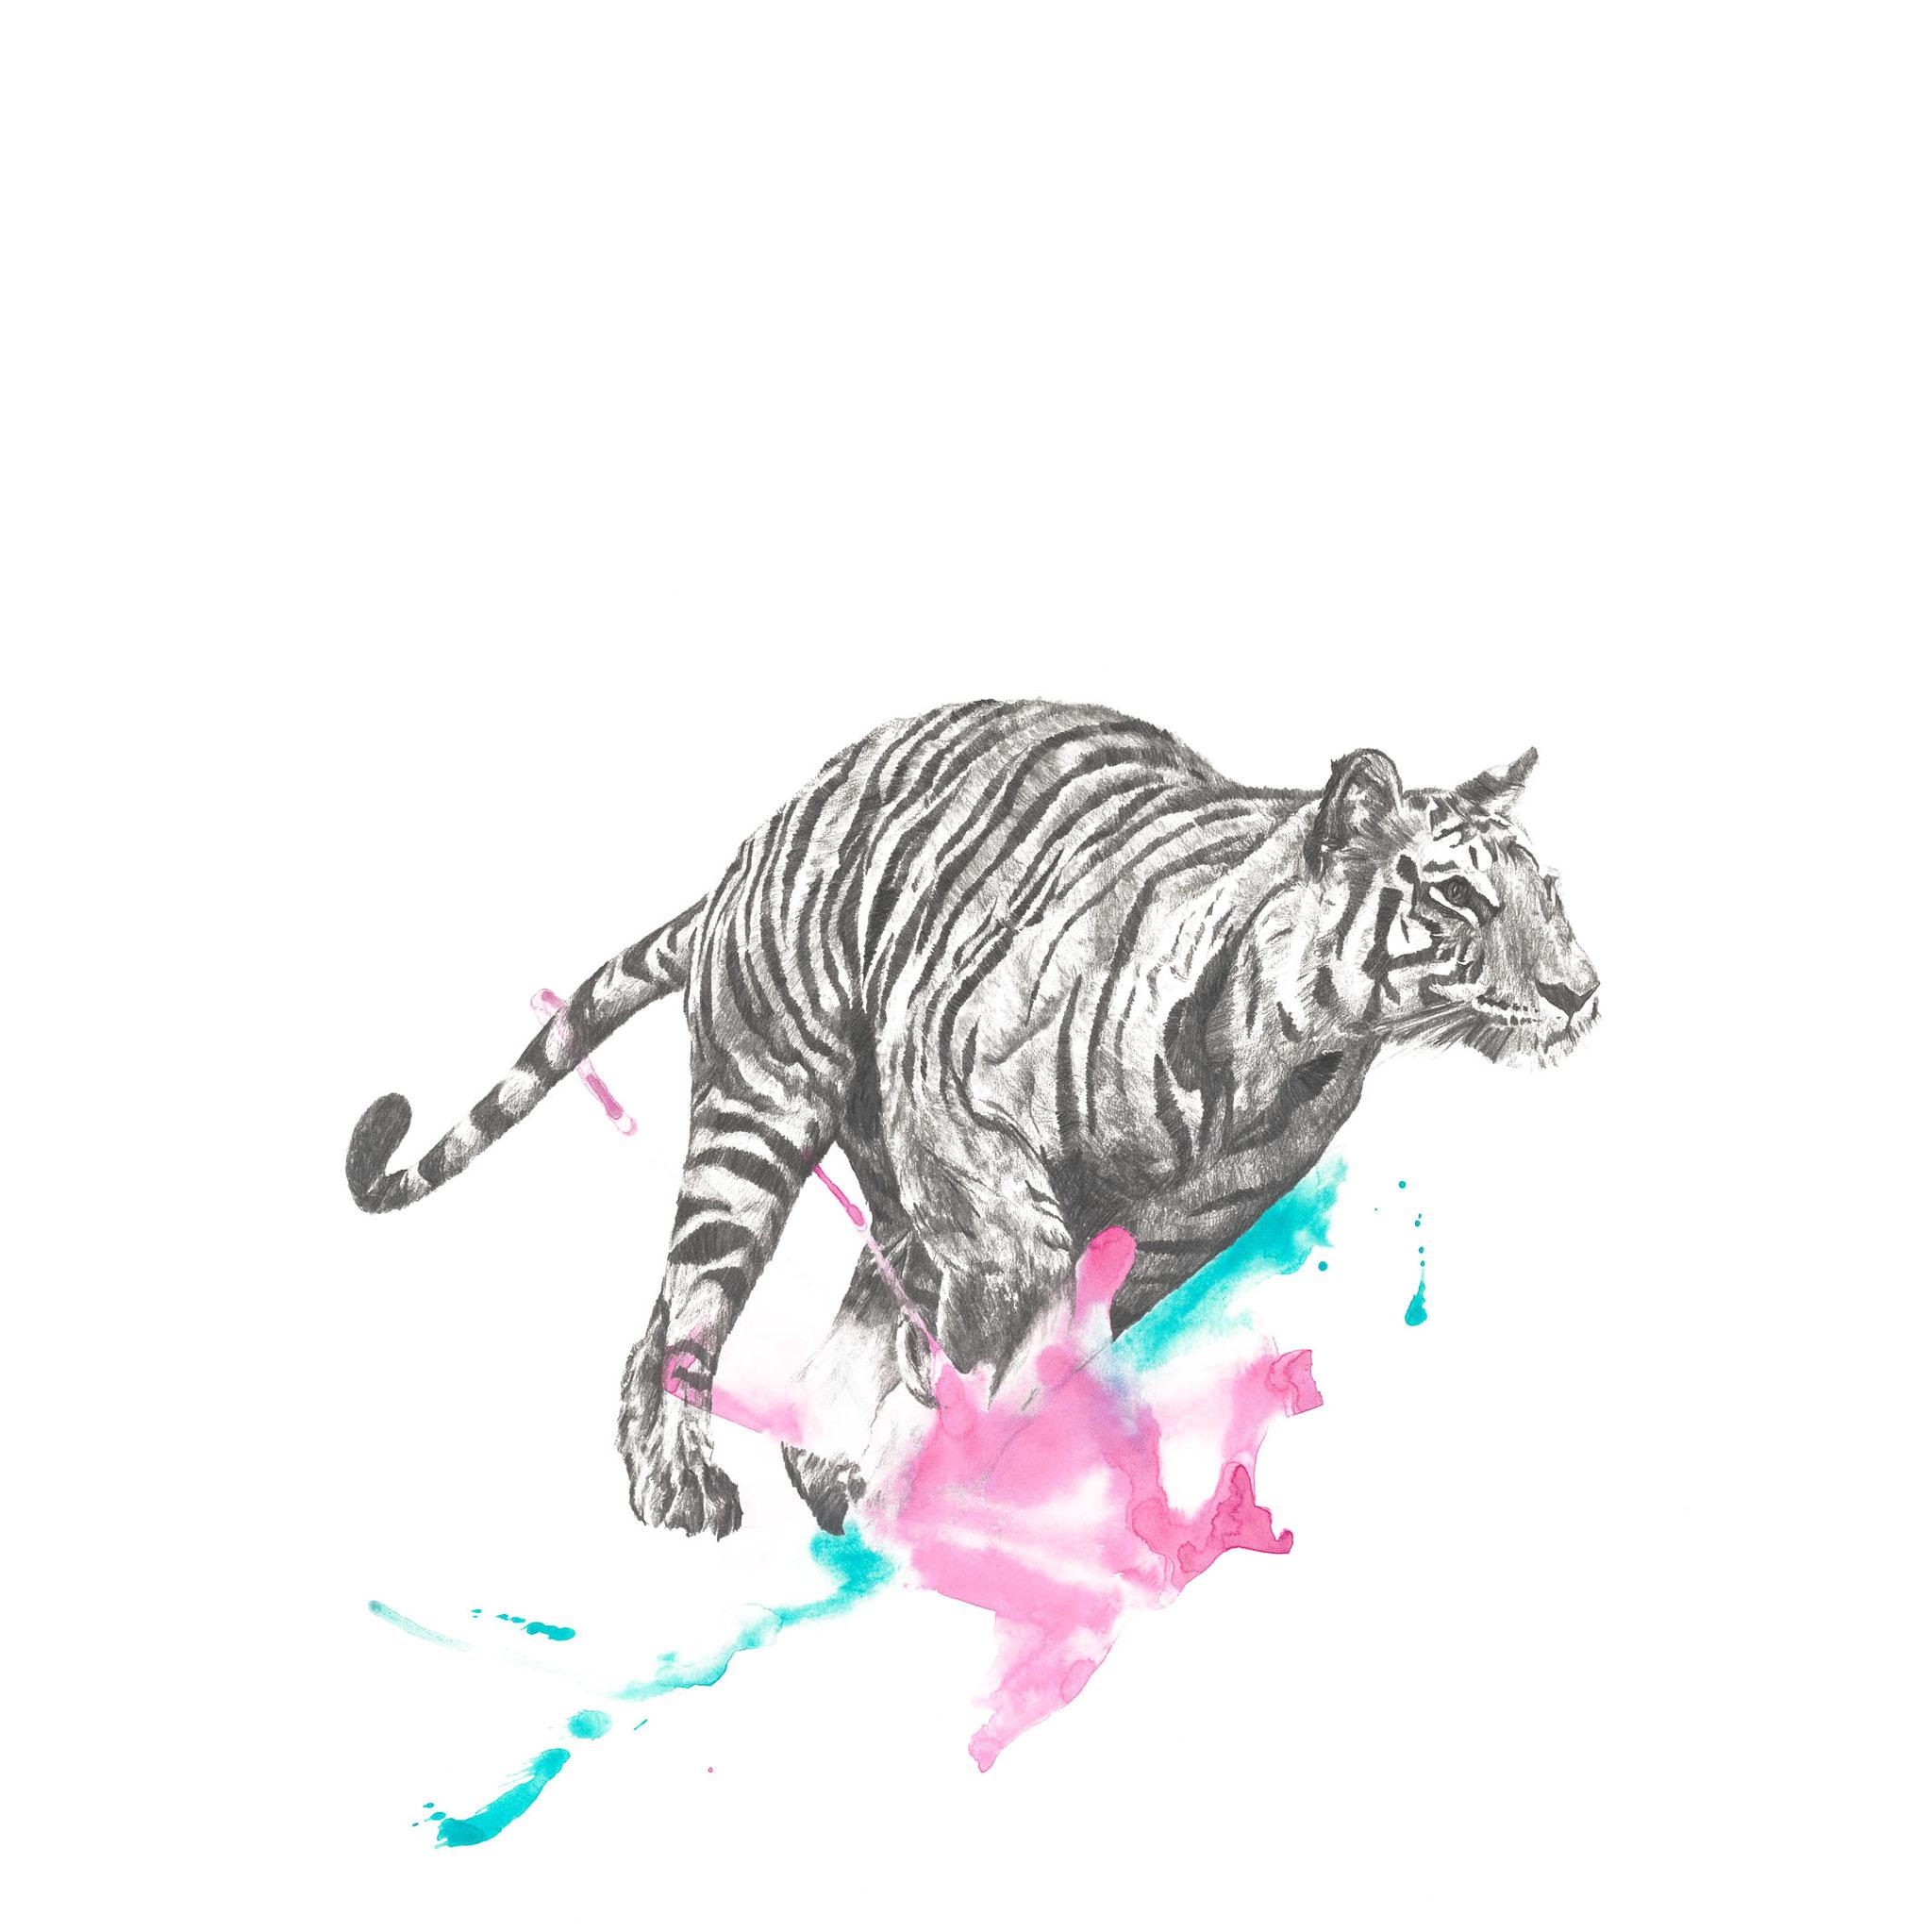 Bewegungsstudie Tiger I 70x70cm pencil, watercolor 2021